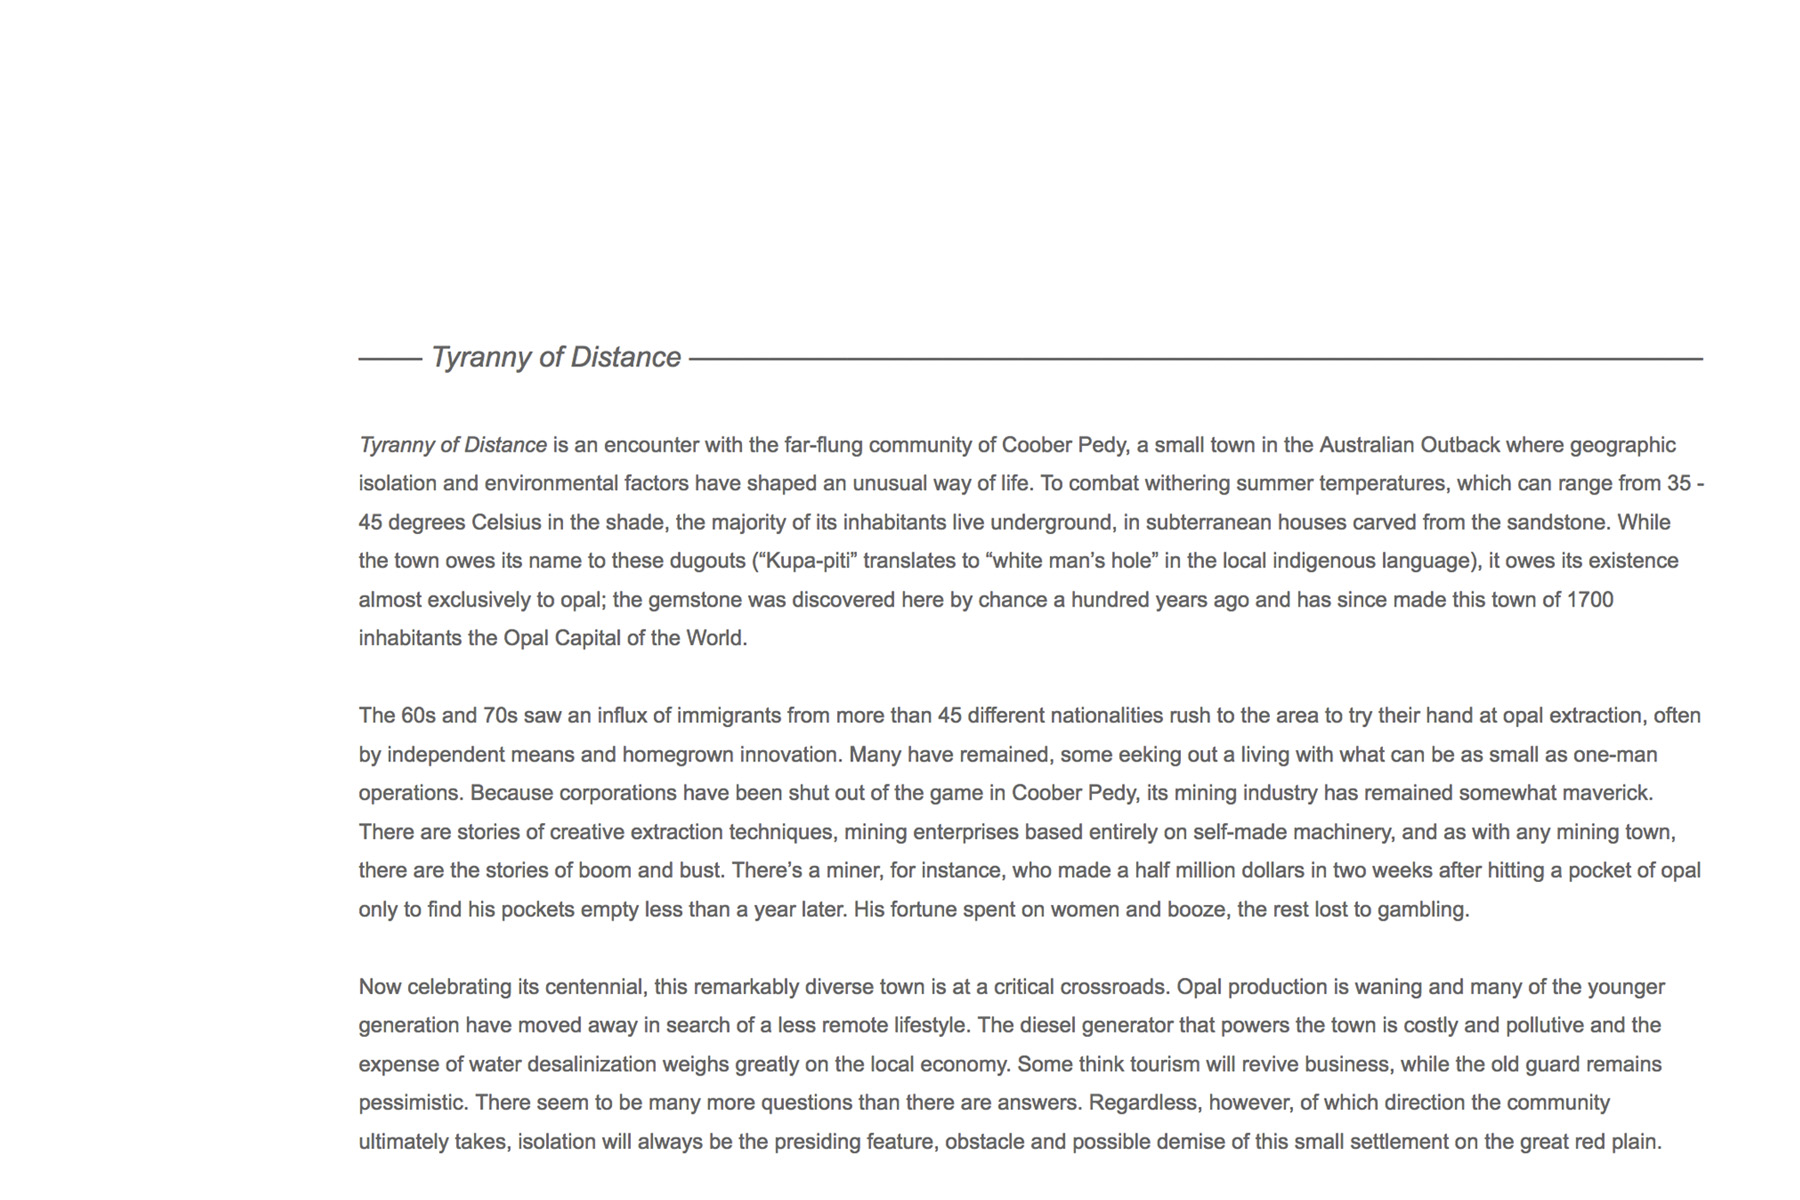 TyrannyOfDistance_Webpage.jpg